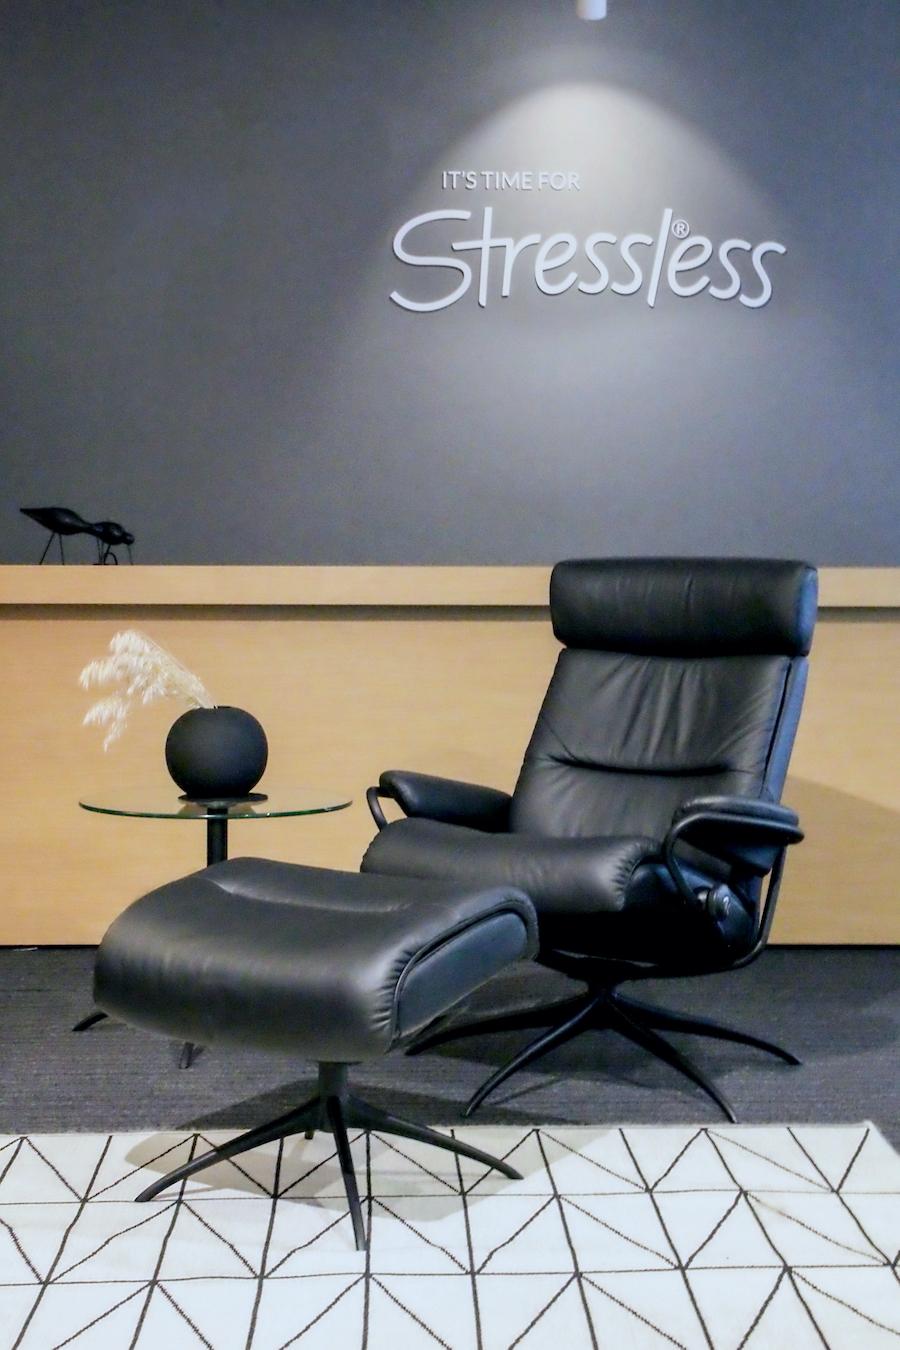 stressless-chair_11